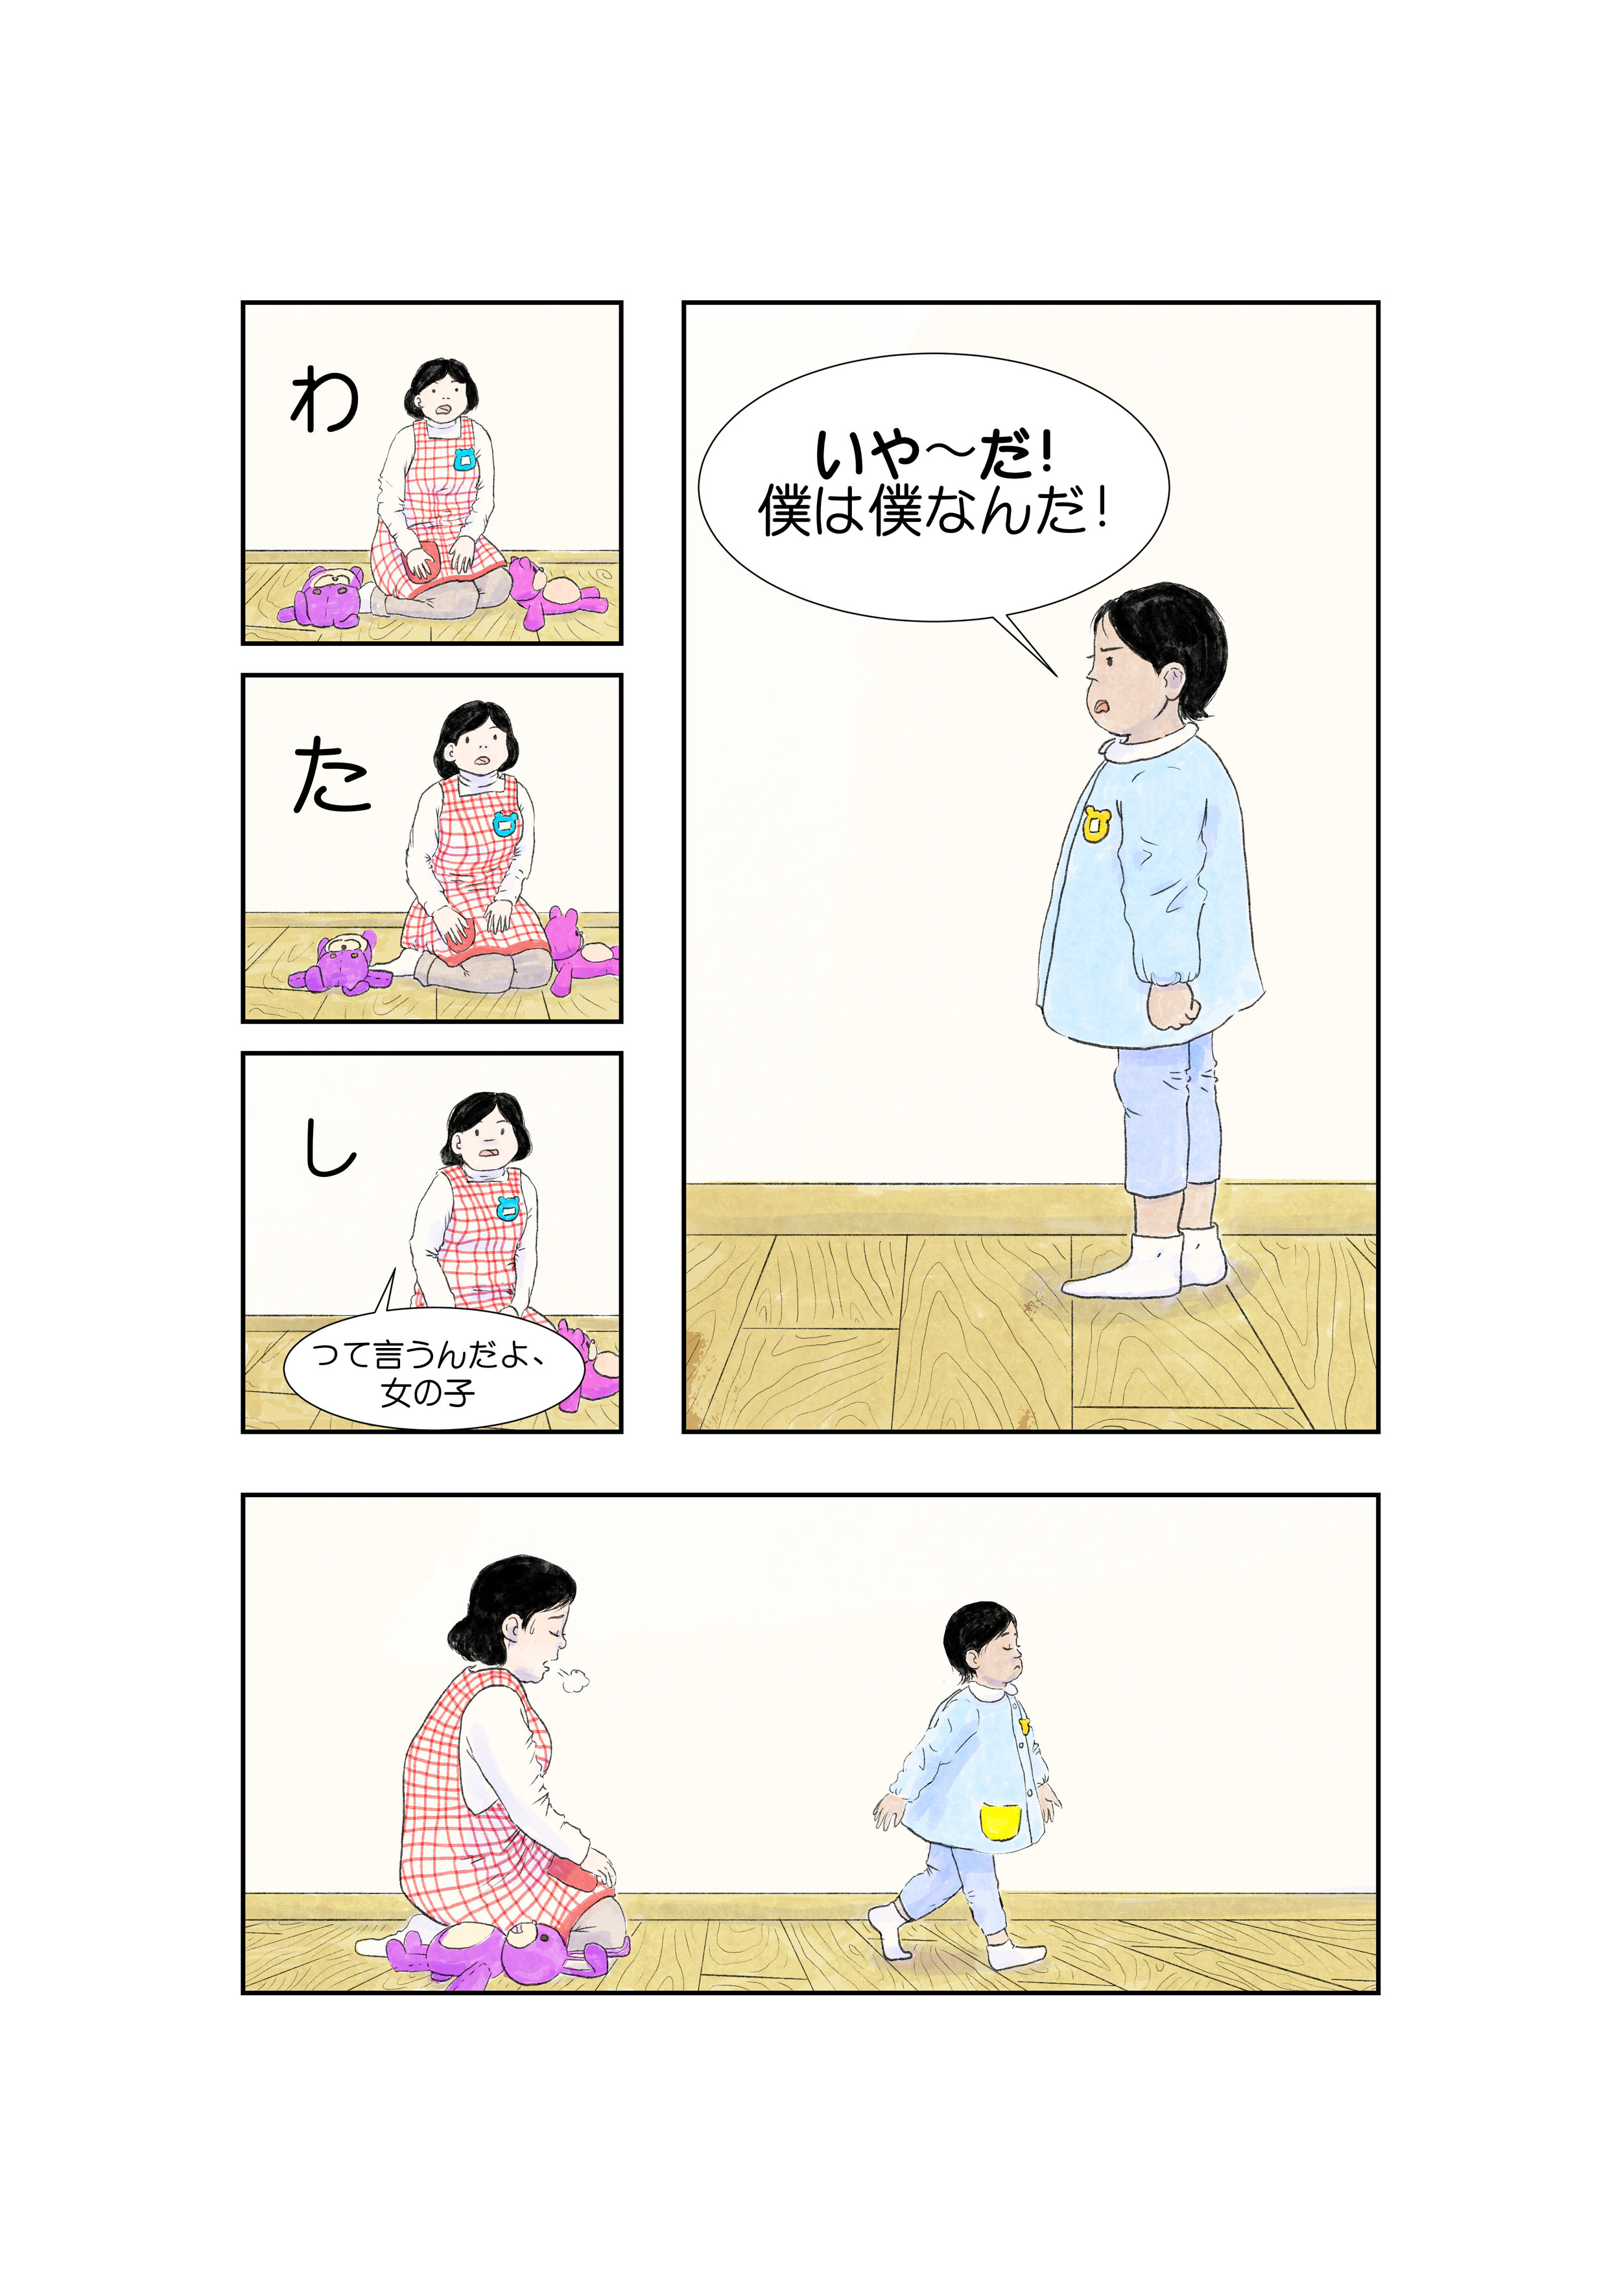 yh1_006.jpg